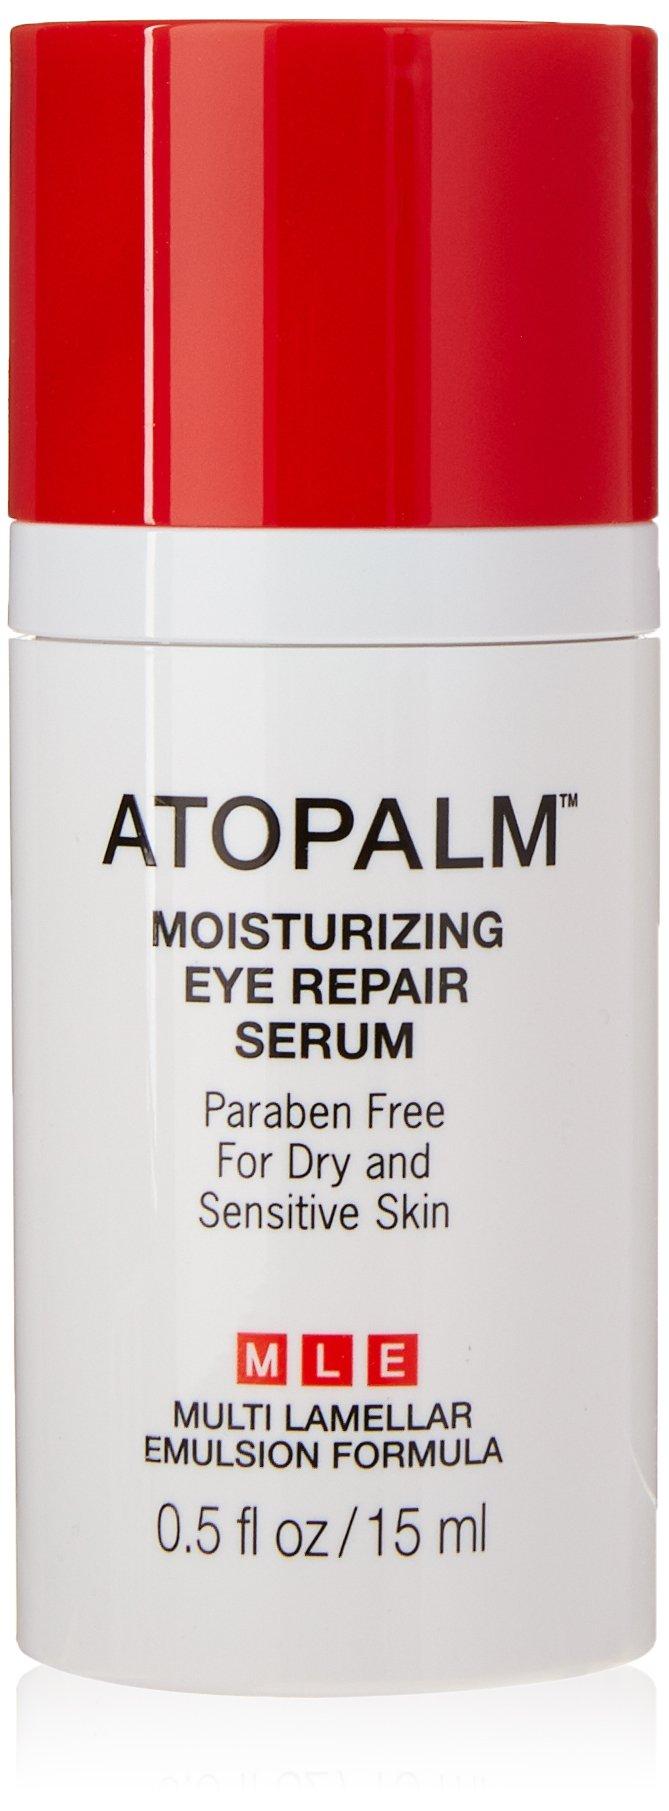 Atopalm Moisturizing Eye Repair Serum, 0.5-Ounce